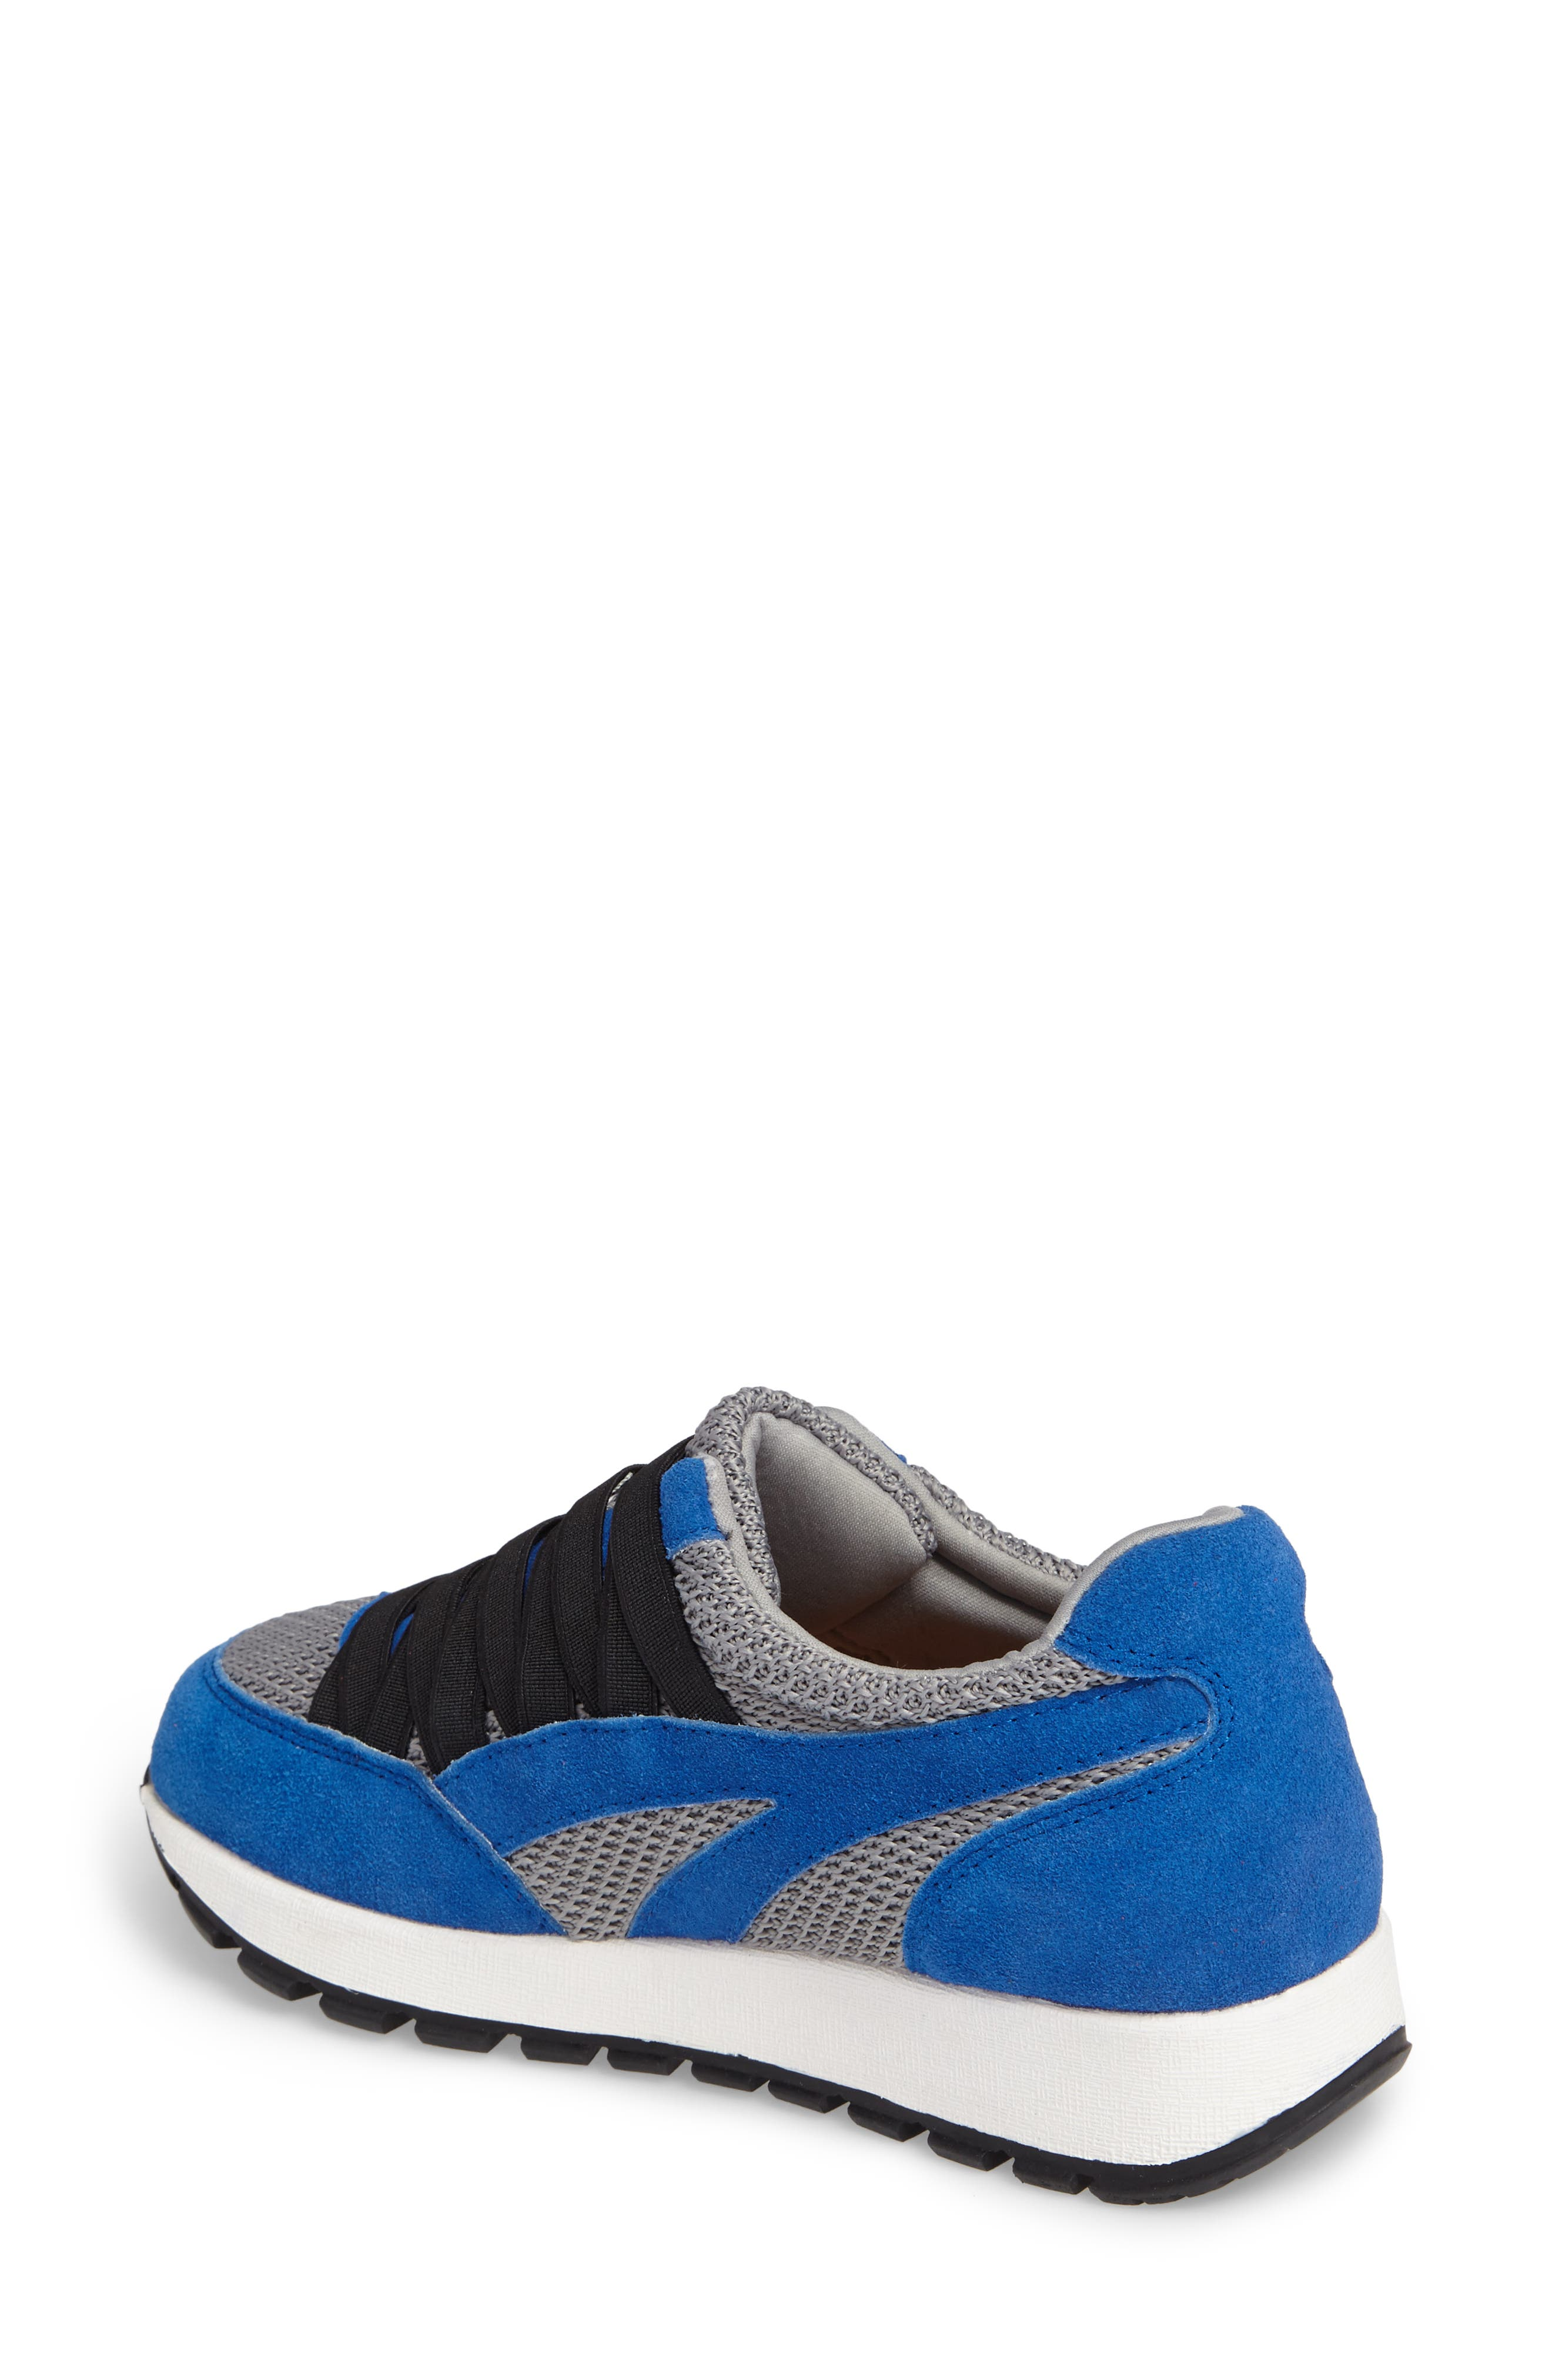 Bernie Mev Tara Cano Sneaker,                             Alternate thumbnail 2, color,                             ROYAL BLUE/ GREY FABRIC